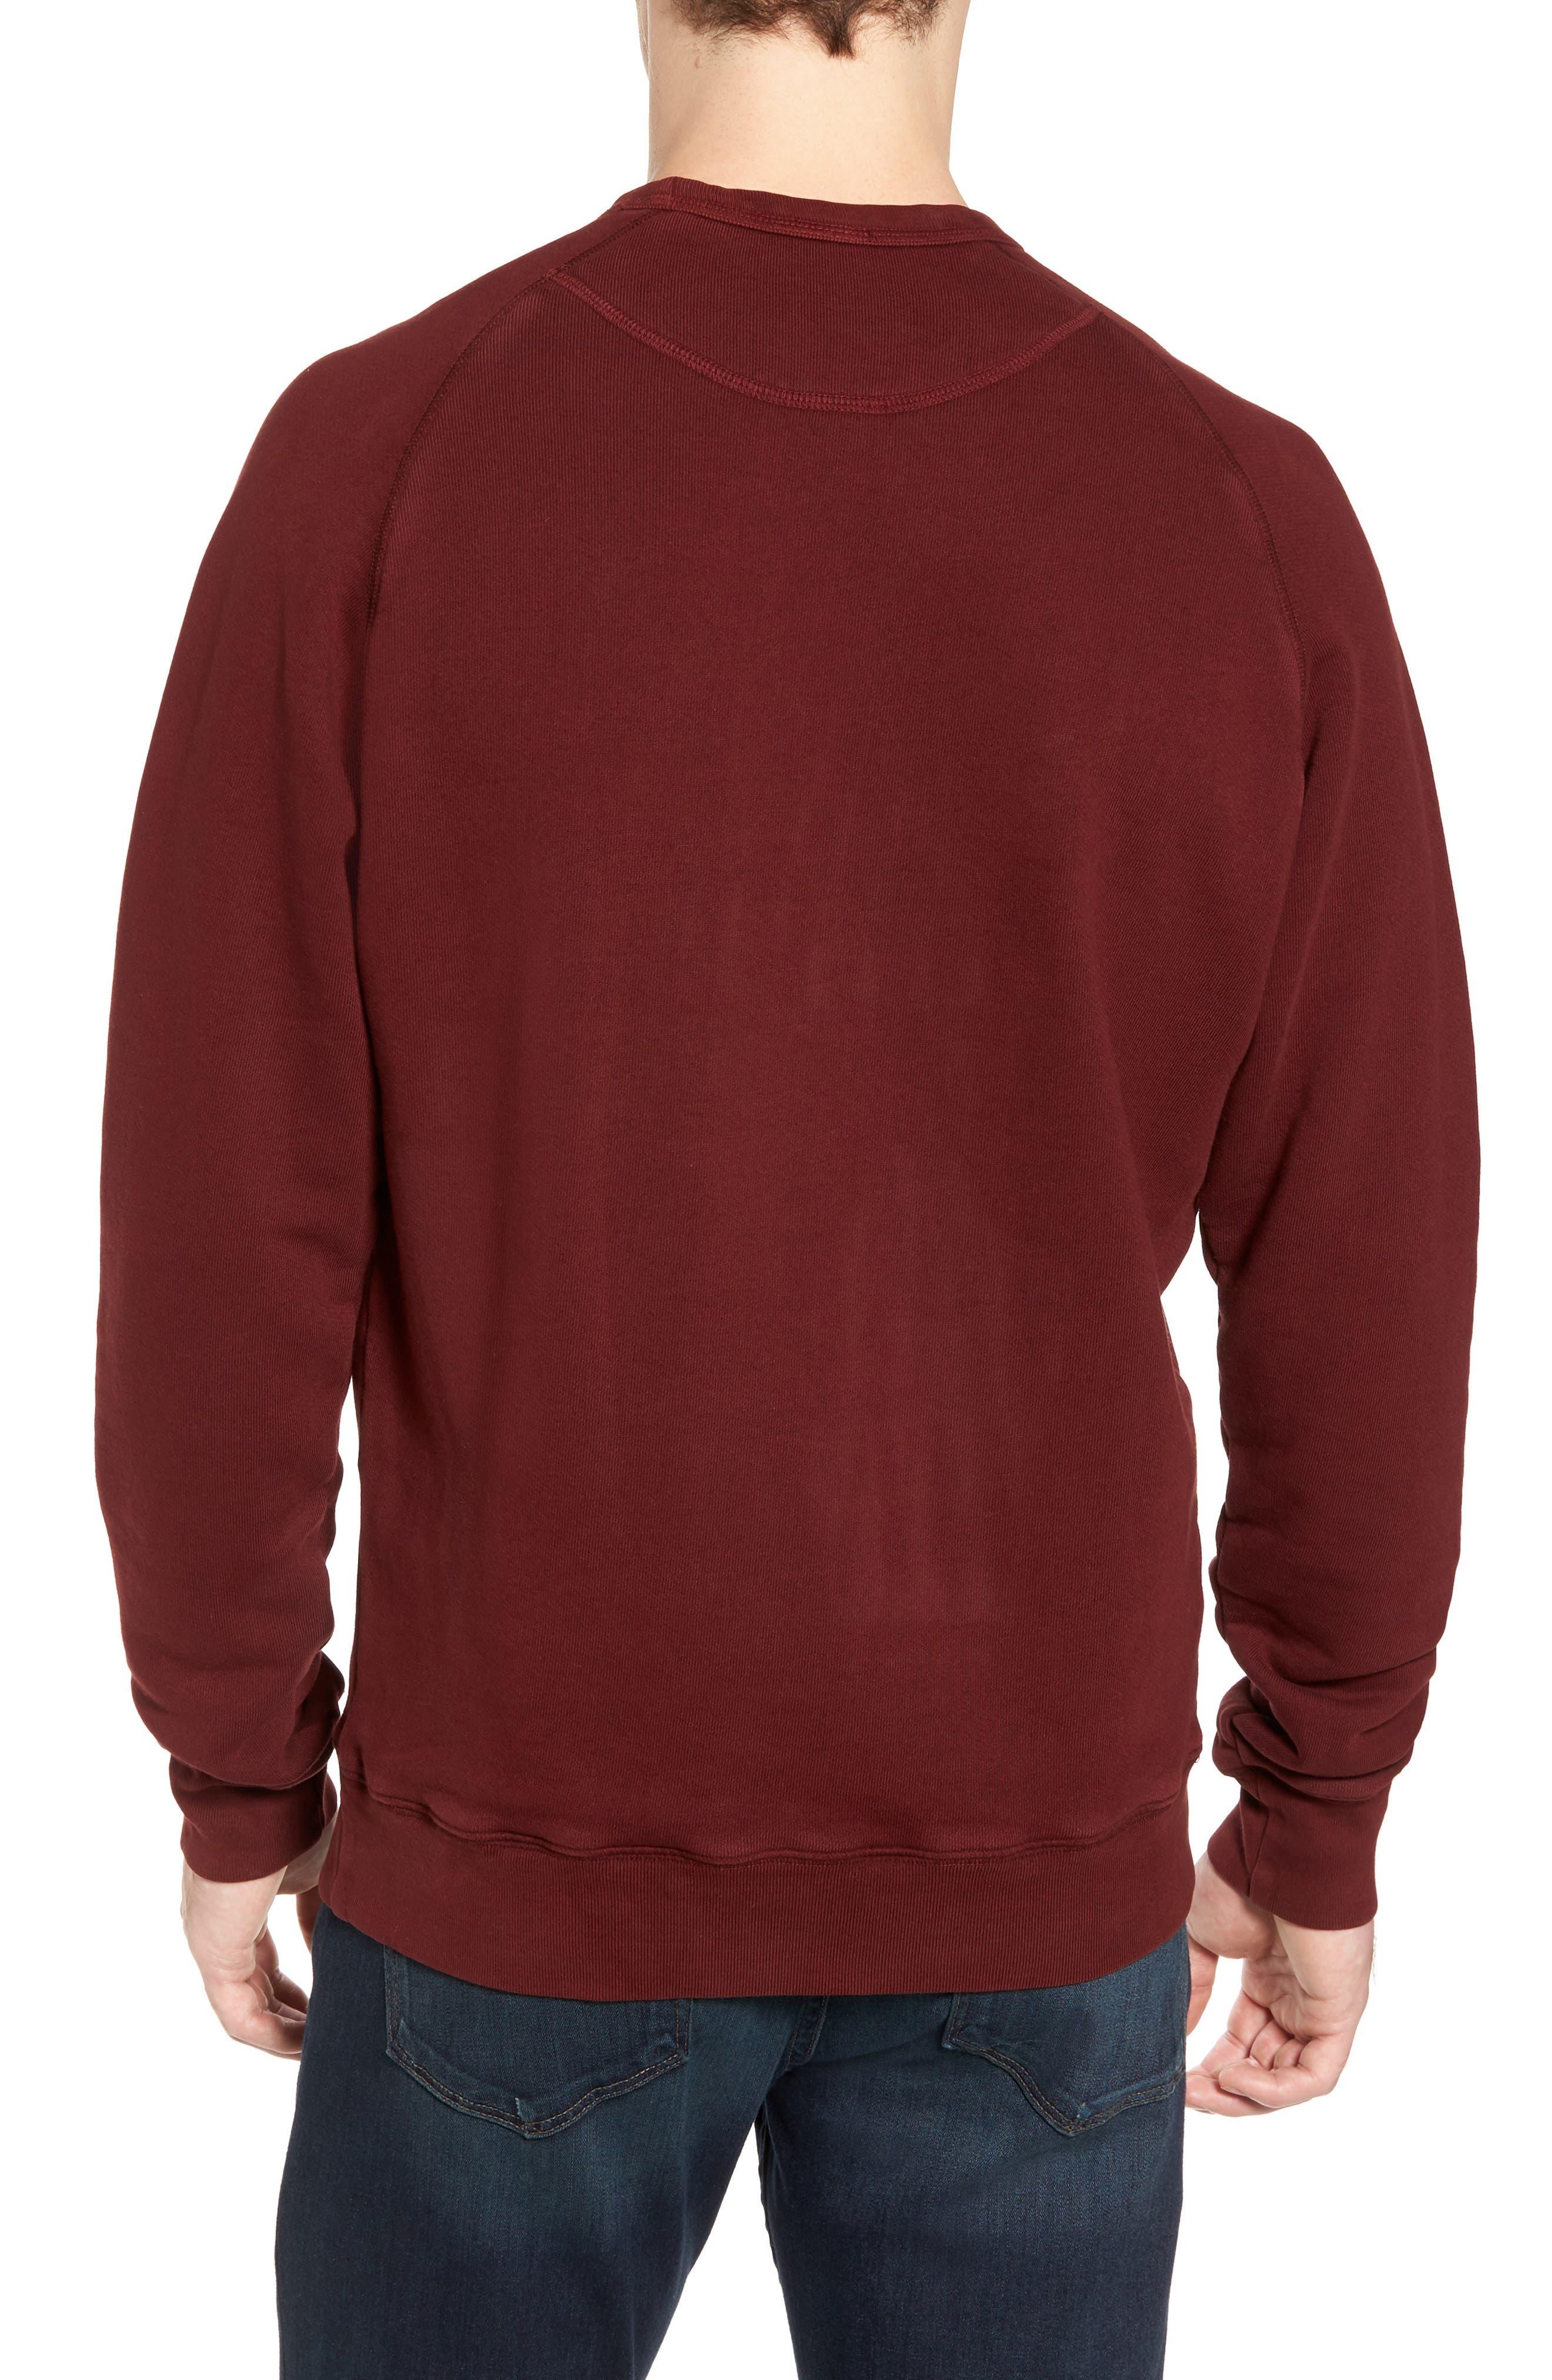 South Sea Raglan Sweatshirt,                             Alternate thumbnail 6, color,